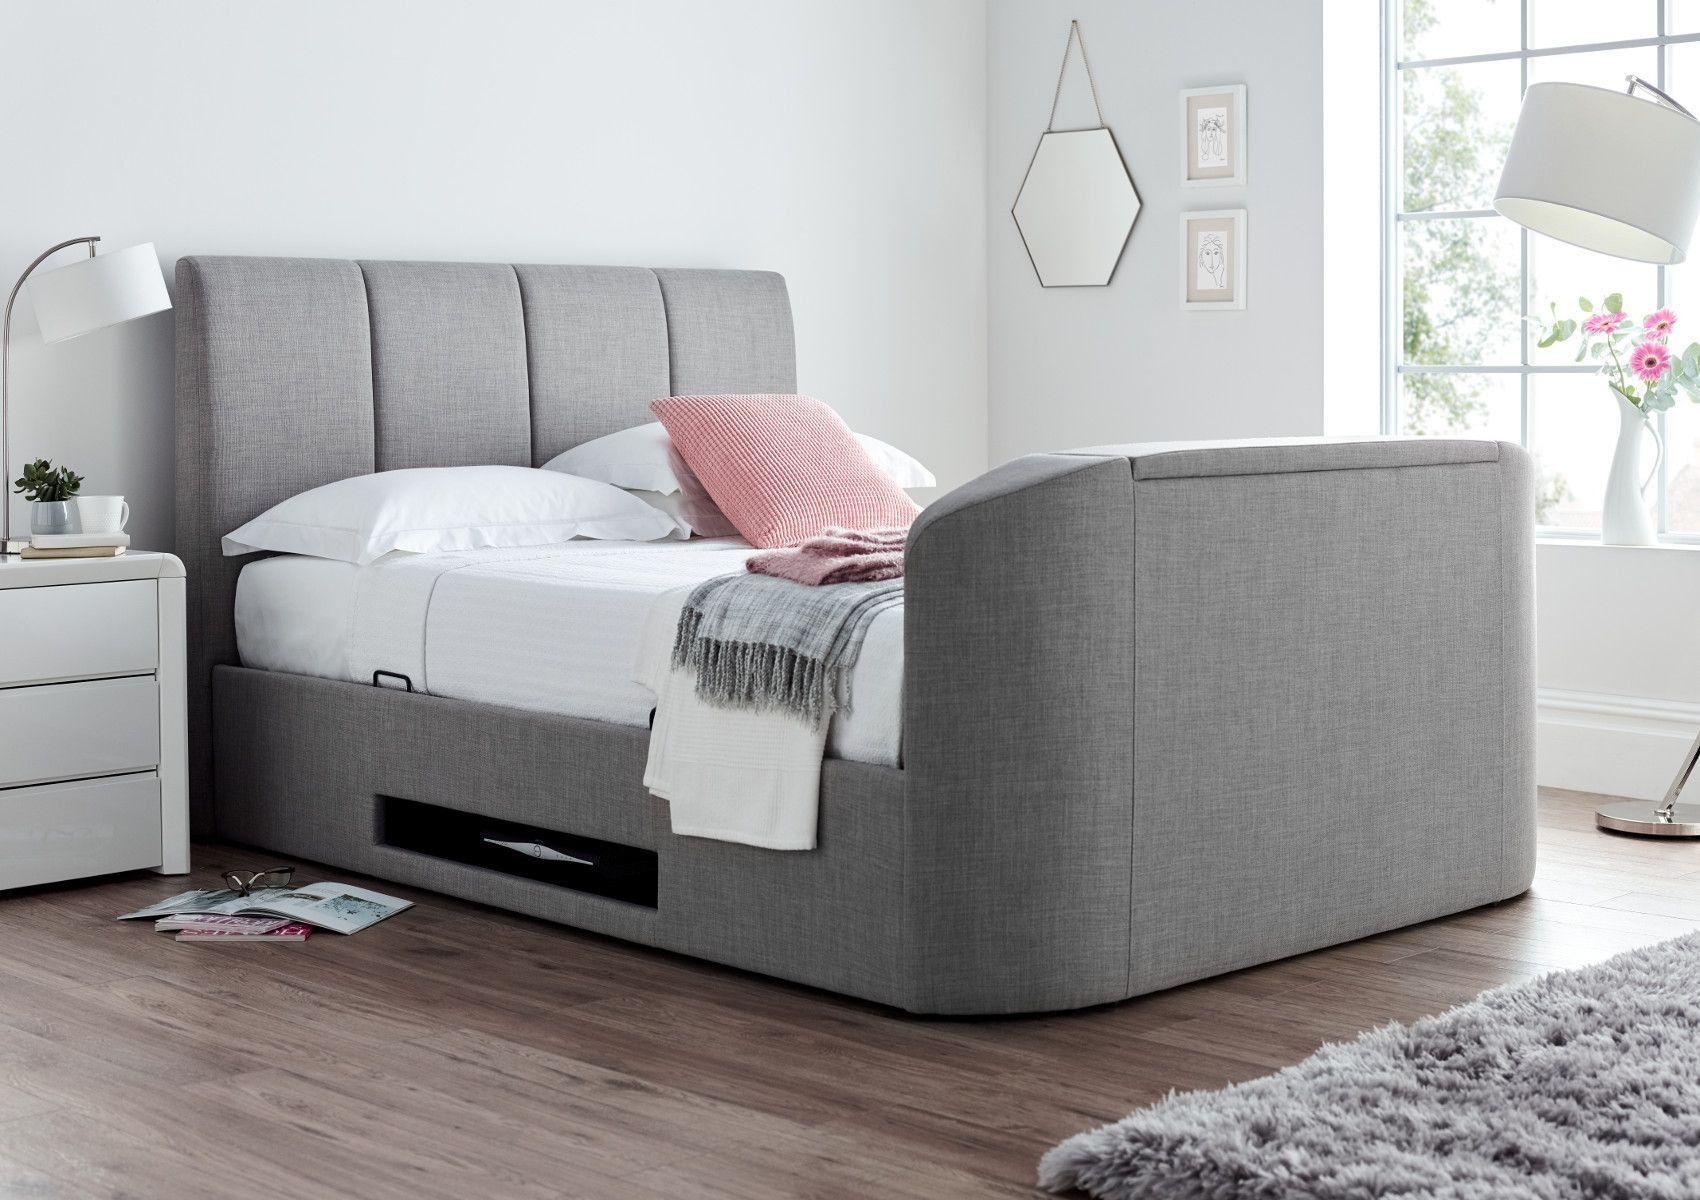 Admirable Copenhagen Upholstered Ottoman Tv Bed Mid Grey In 2019 Creativecarmelina Interior Chair Design Creativecarmelinacom